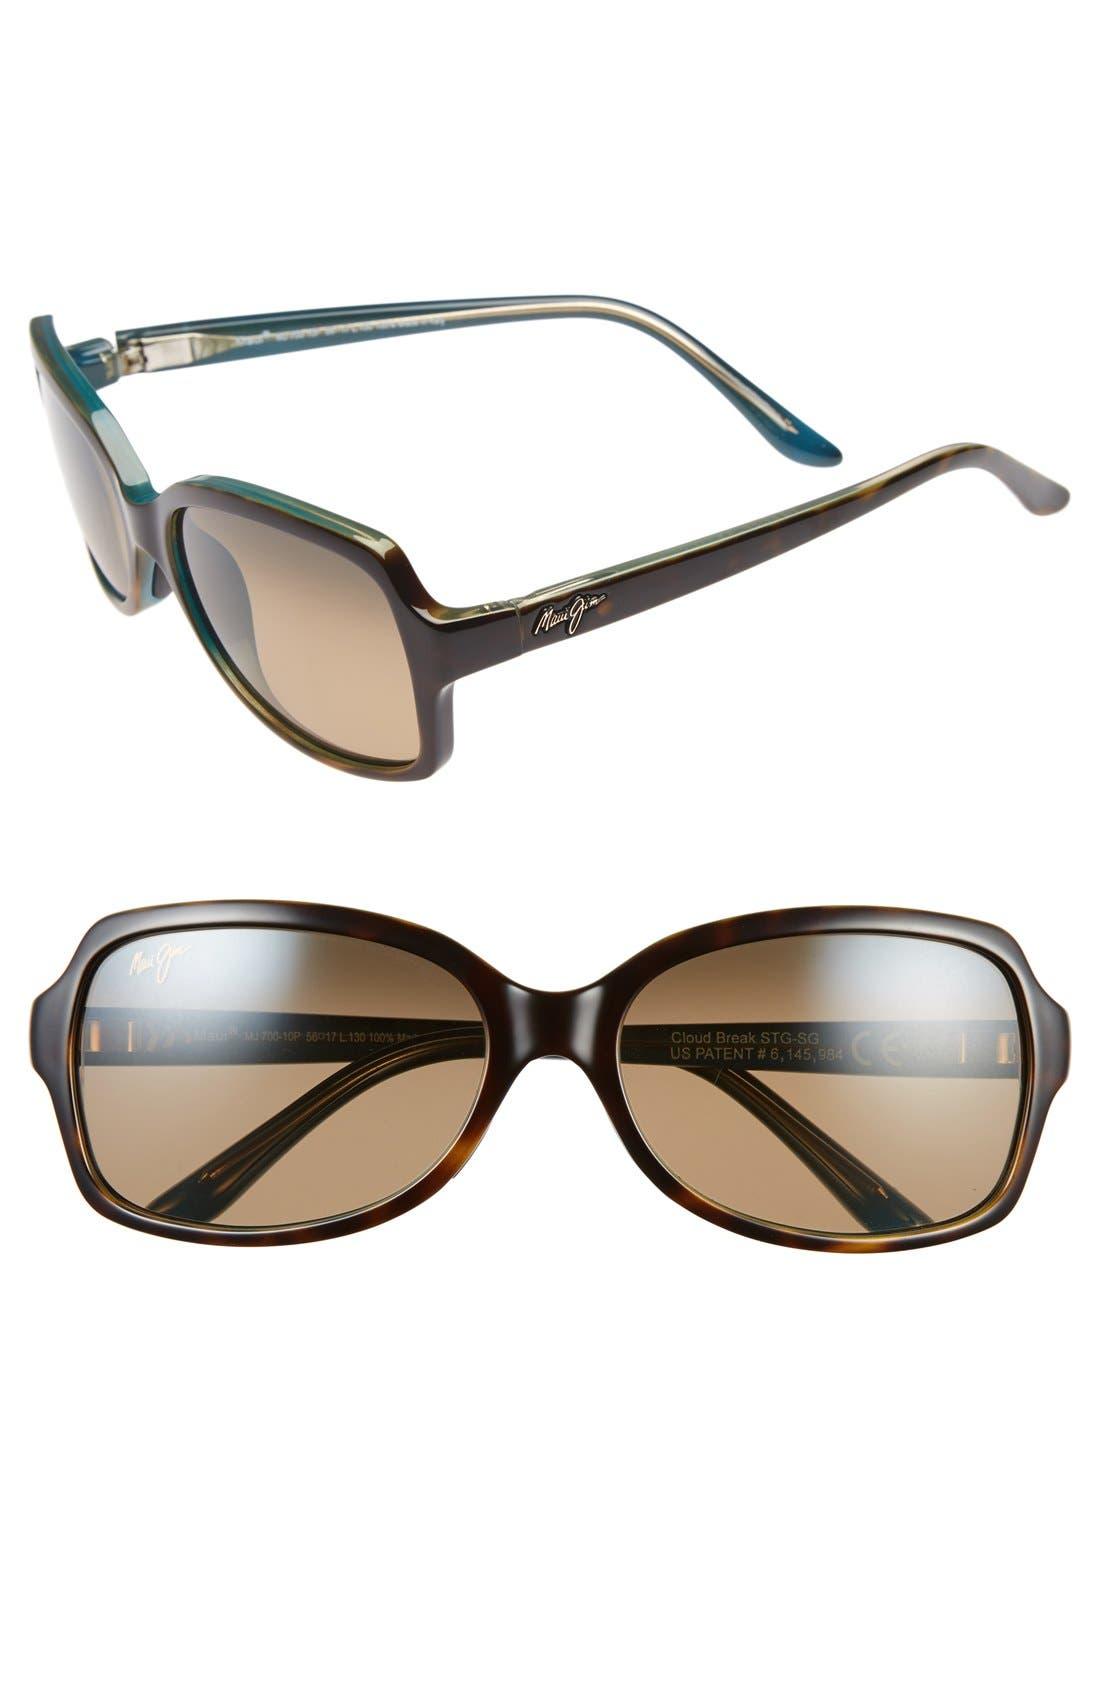 MAUI JIM Cloud Break 56mm PolarizedPlus2<sup>®</sup> Sunglasses